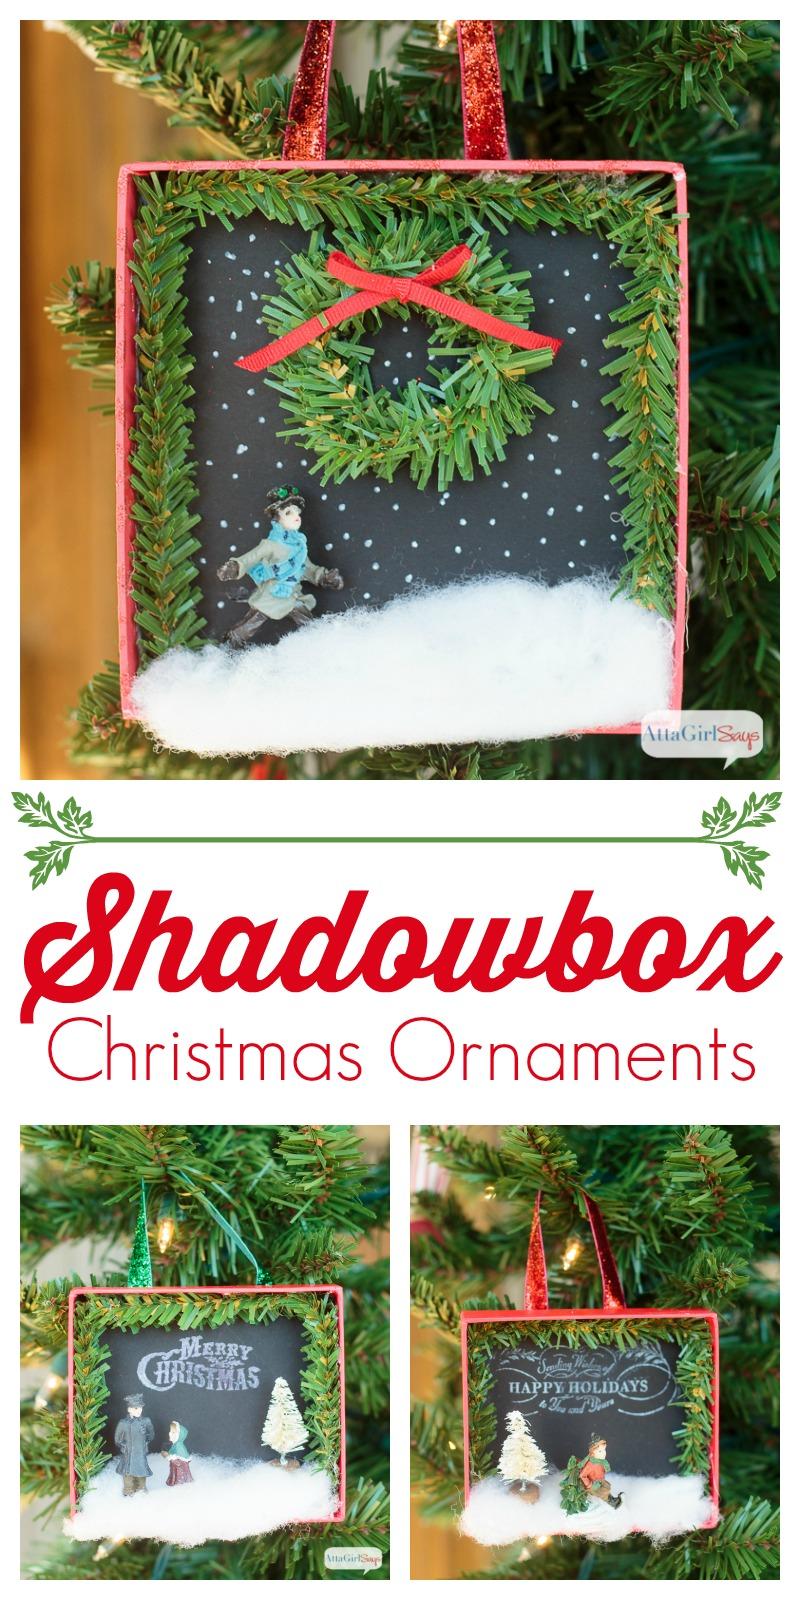 Shadowbox Diy Christmas Ornaments Atta Girl Says